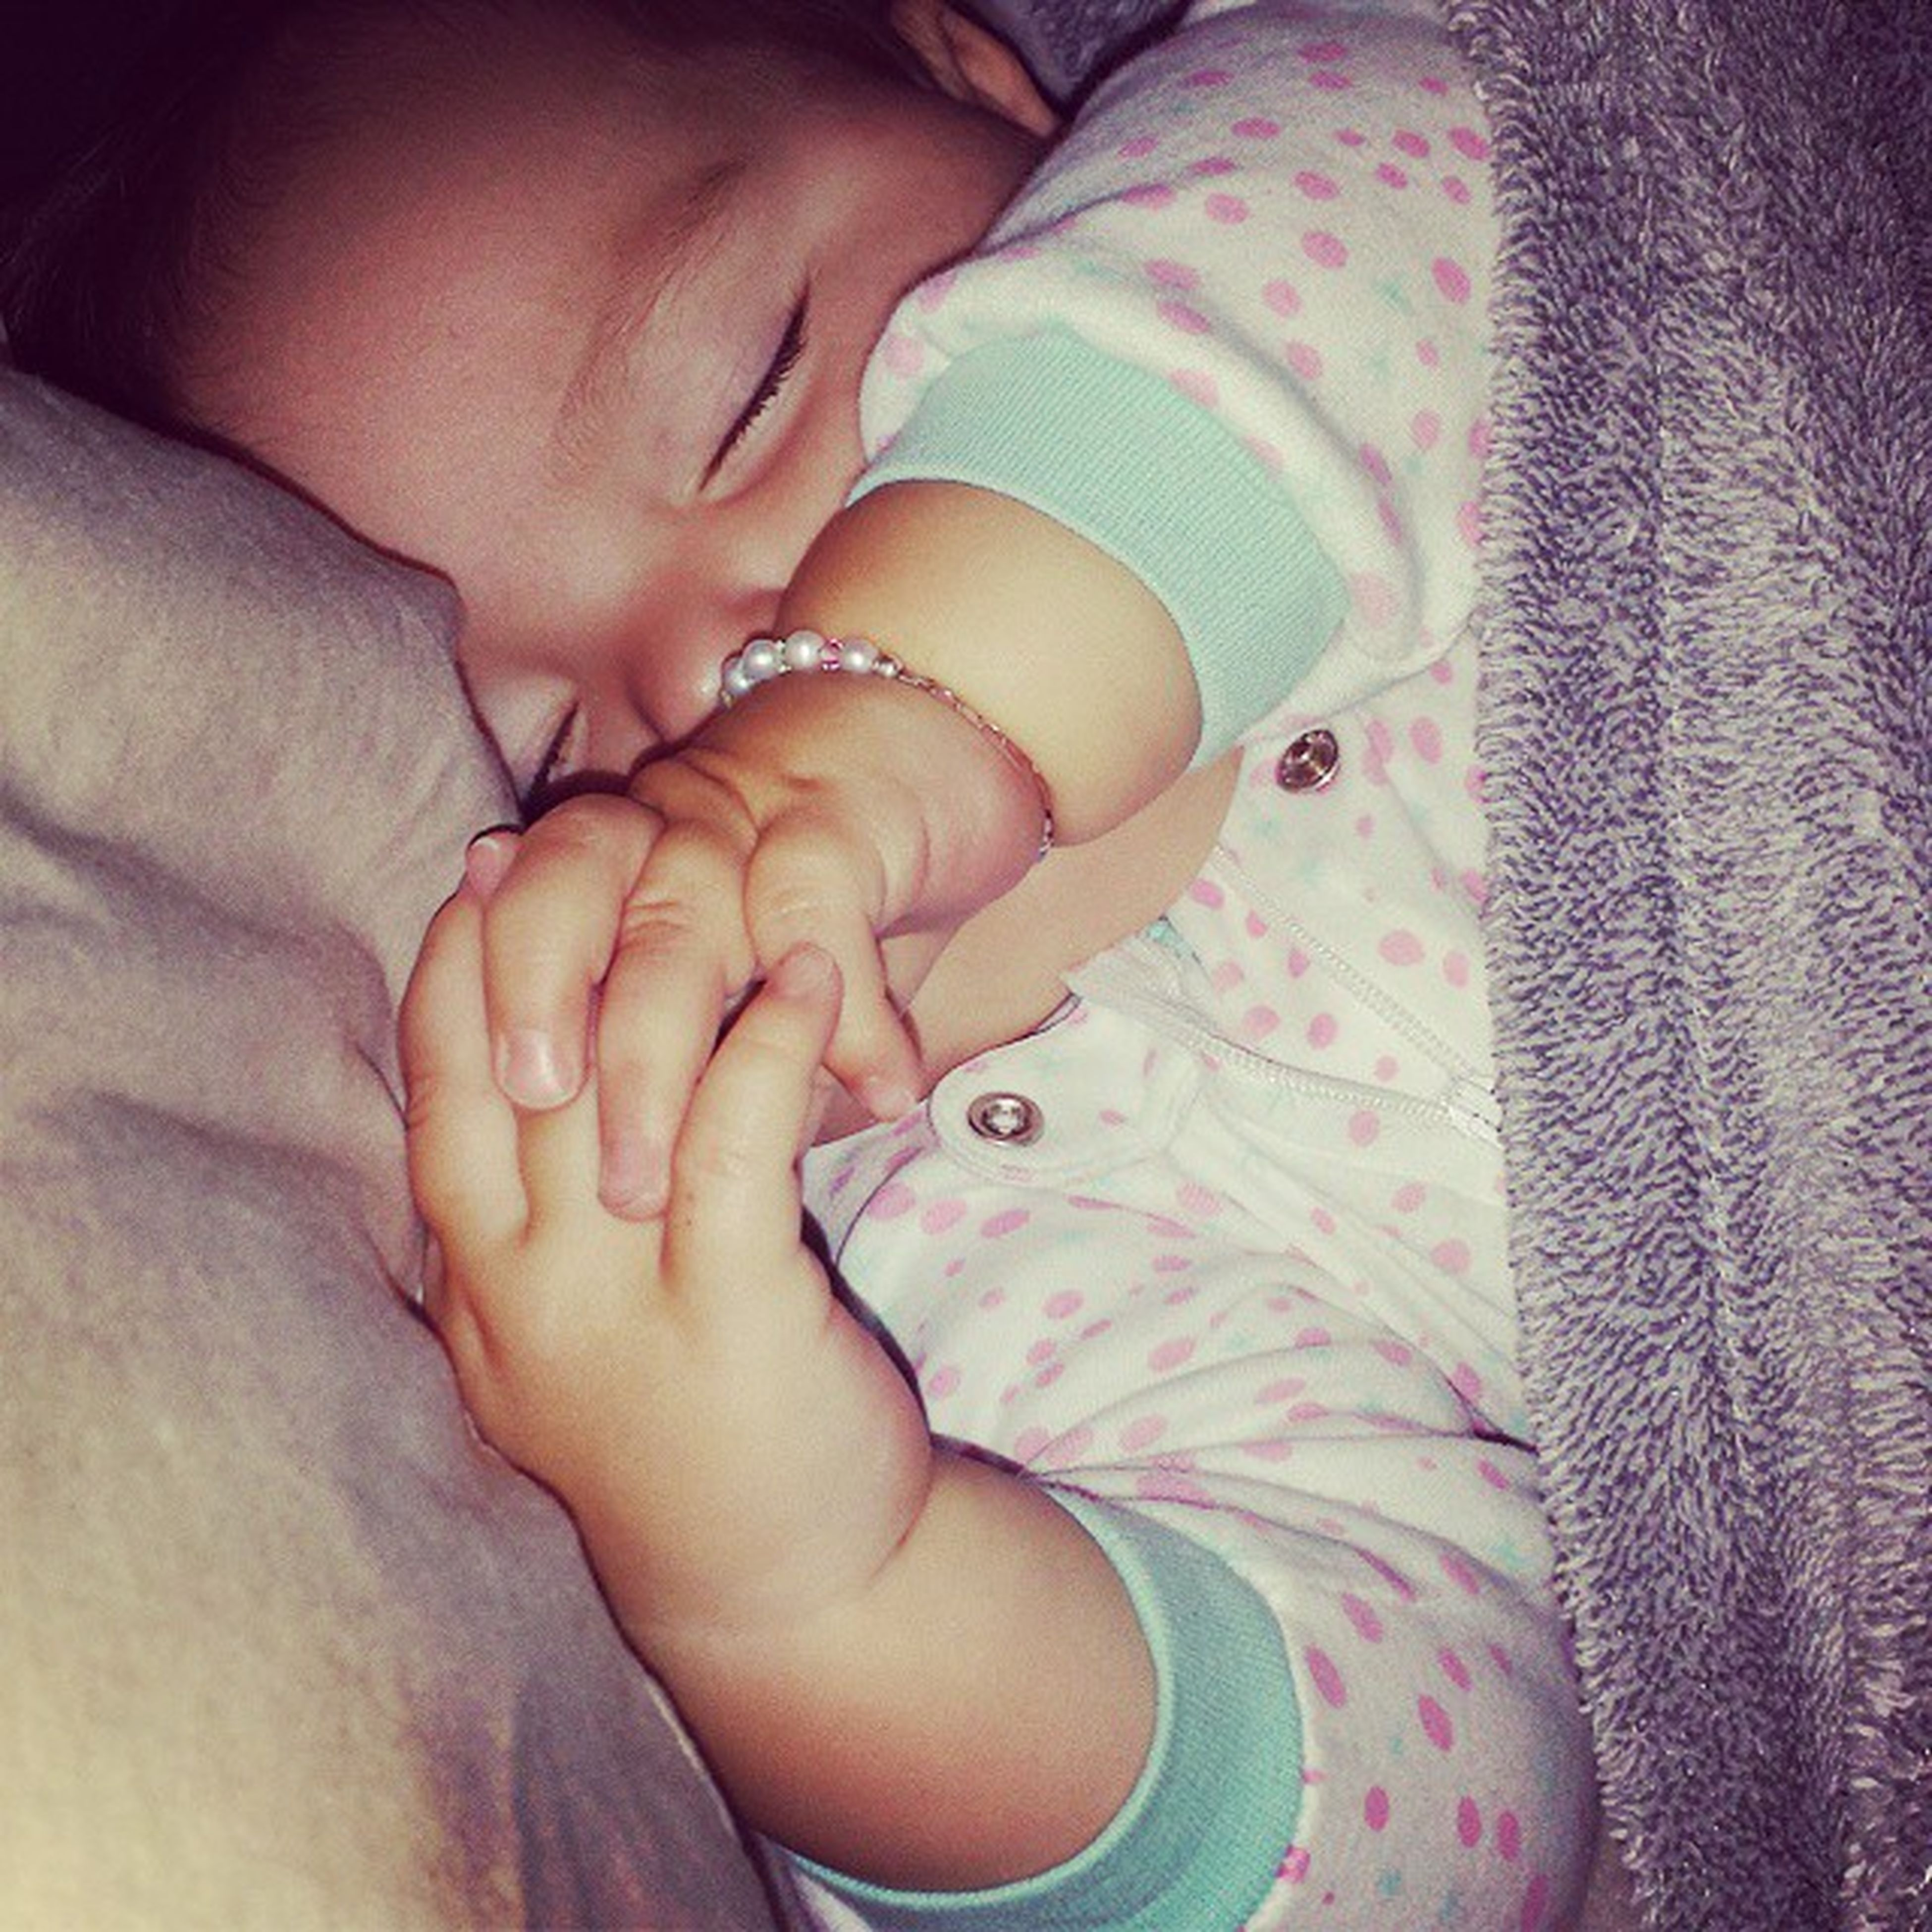 Sleeping baby Prayingbaby Gods miraclesInnocence